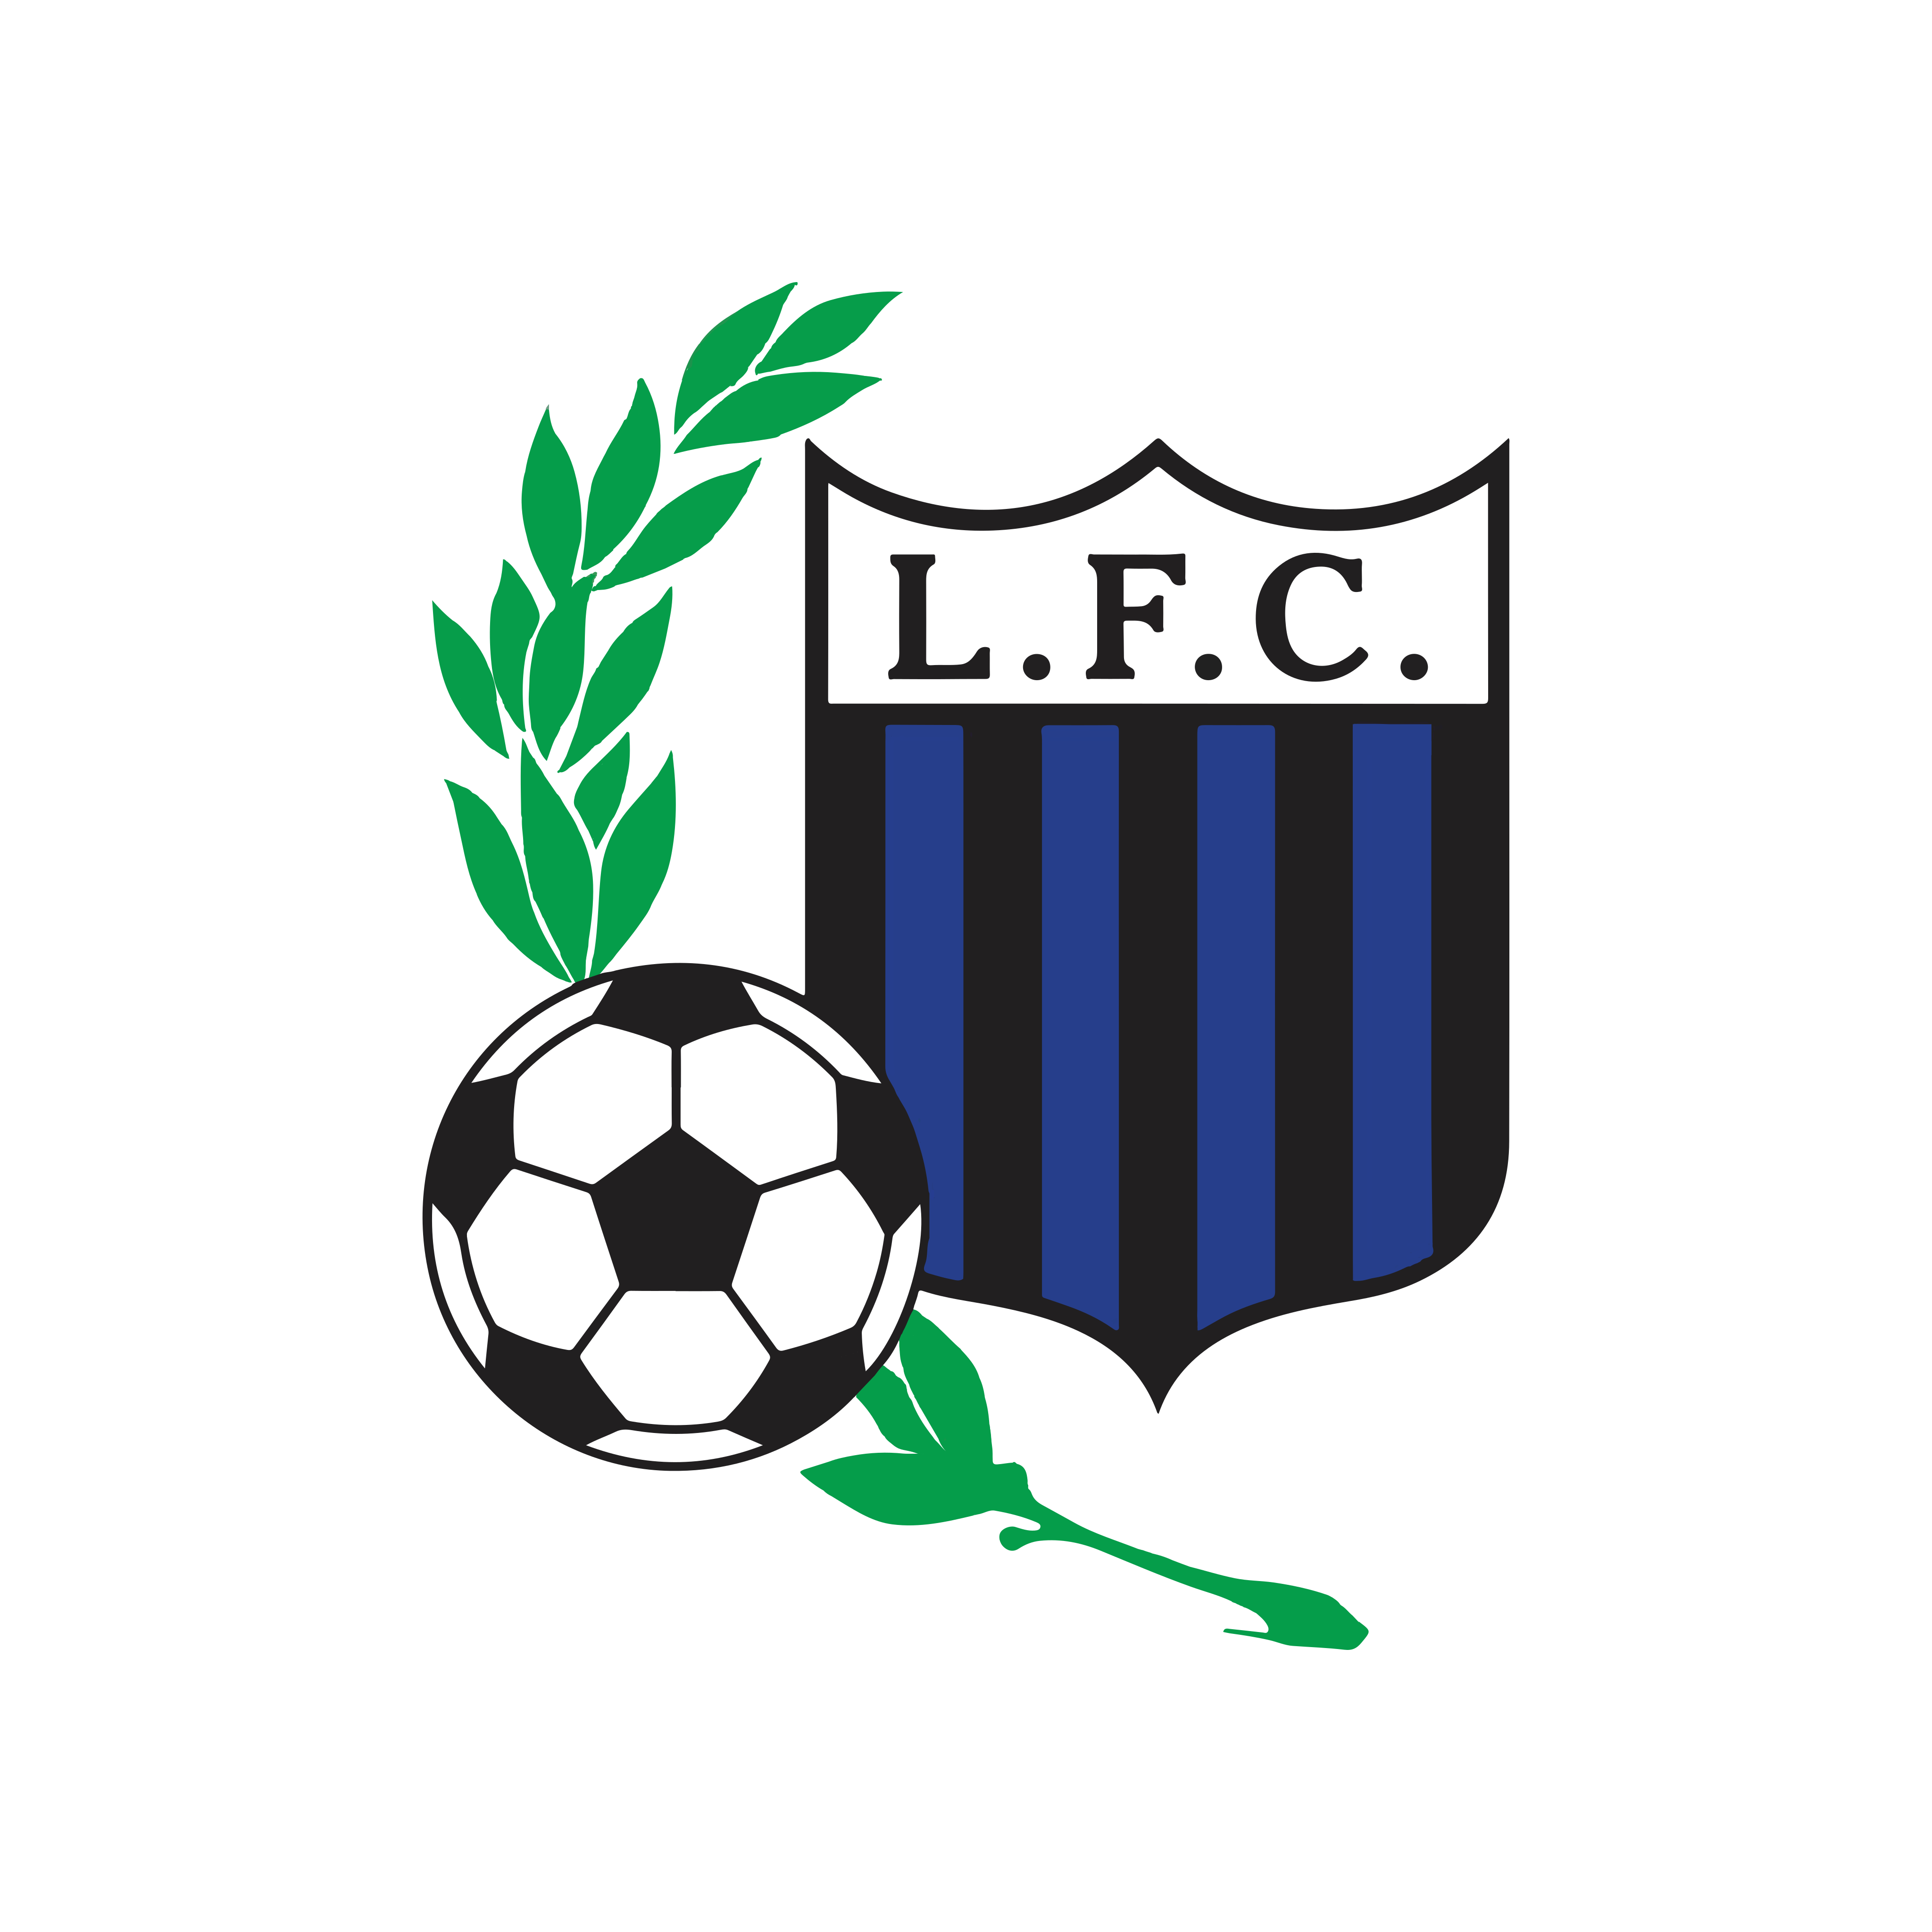 liverpool fc uruguai logo 0 - Liverpool FC (Uruguay) - Logo